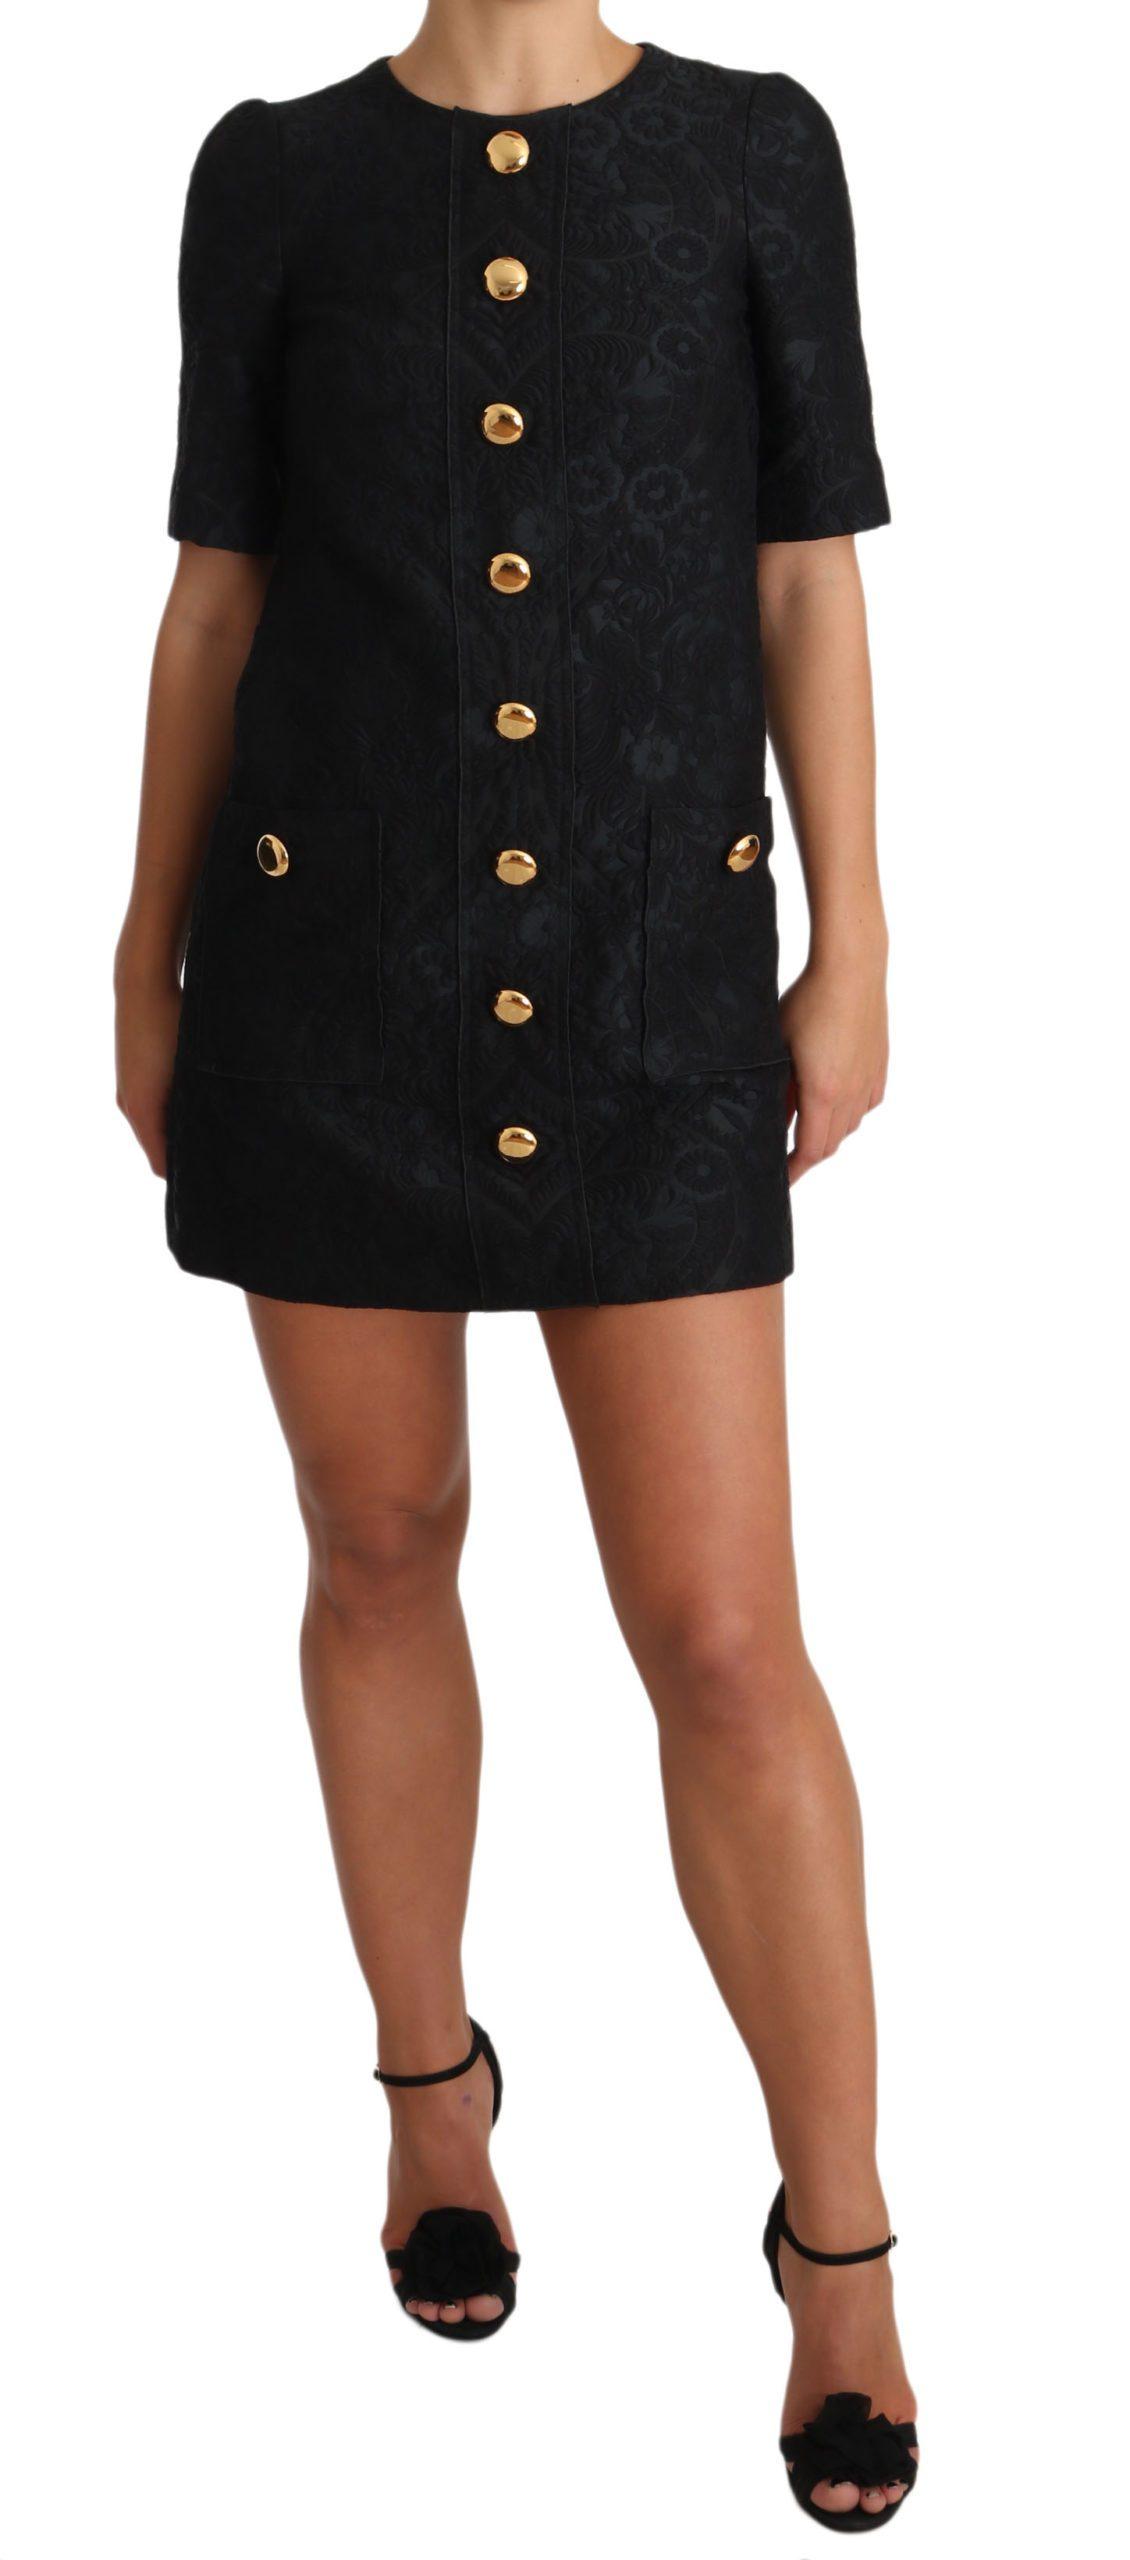 Dolce & Gabbana Women's Dress Black DR1931 - IT36   XS